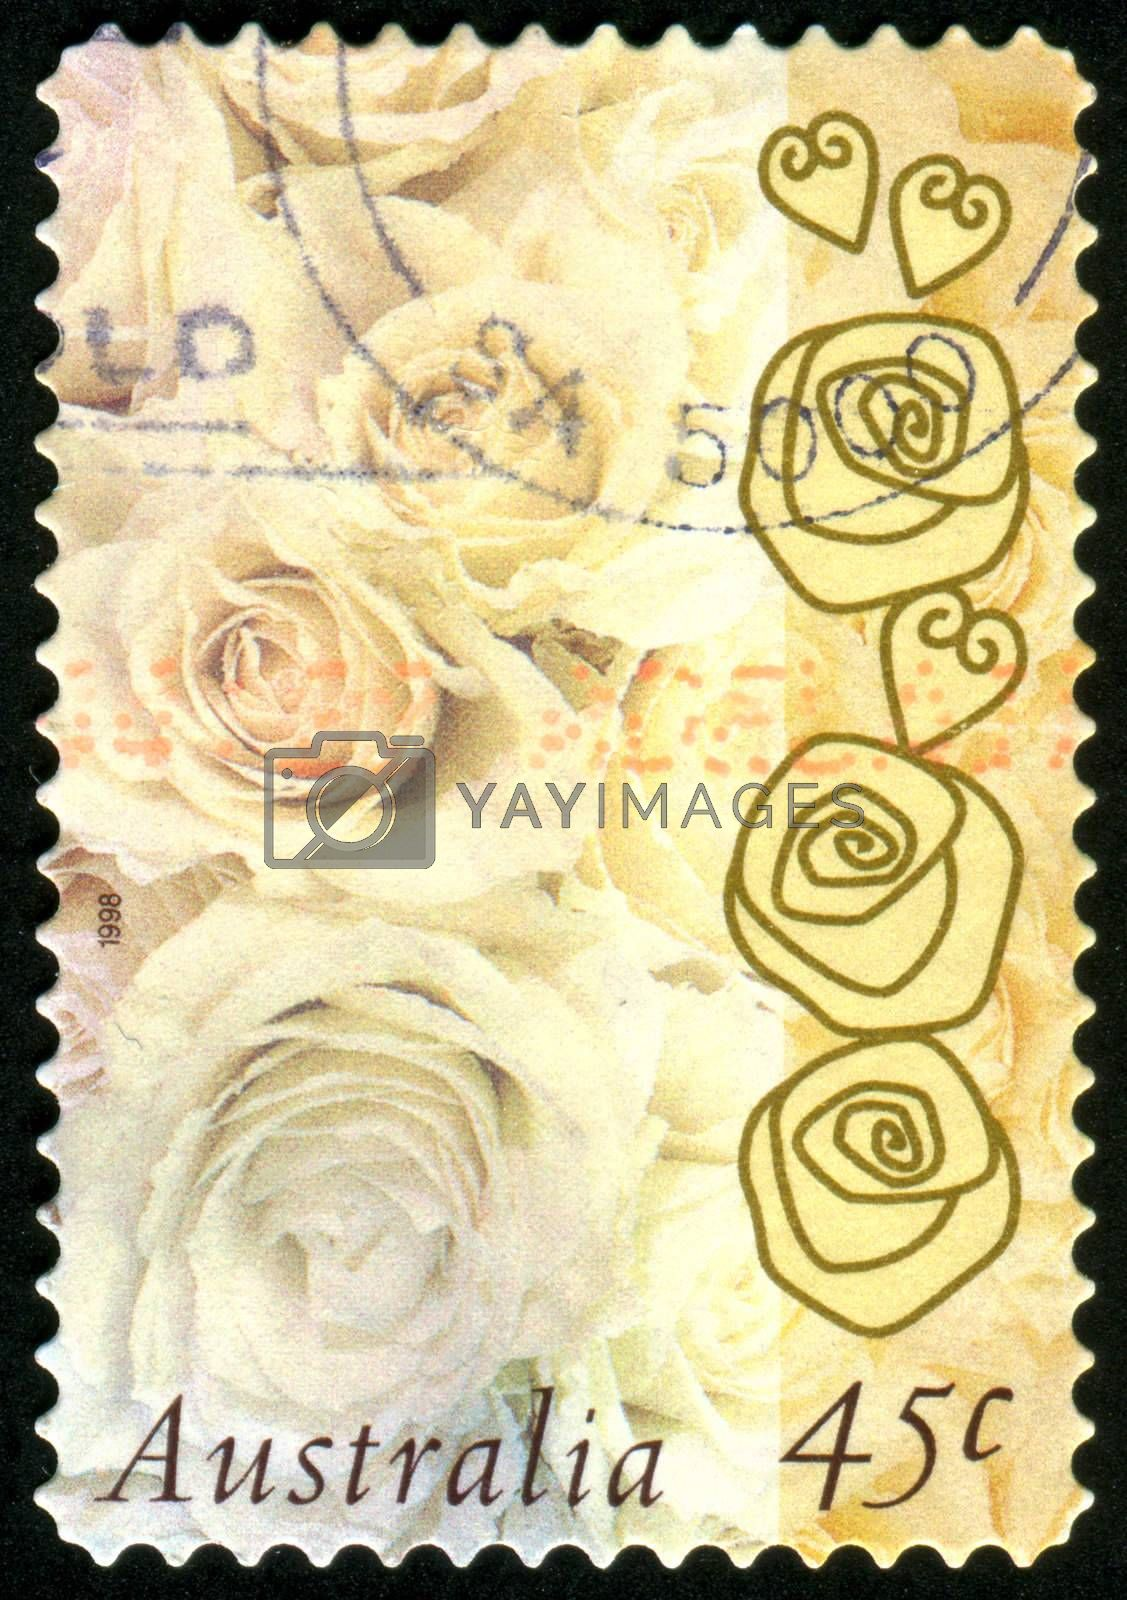 AUSTRALIA - CIRCA 1998: stamp printed by Australia, shows Roses, circa 1998